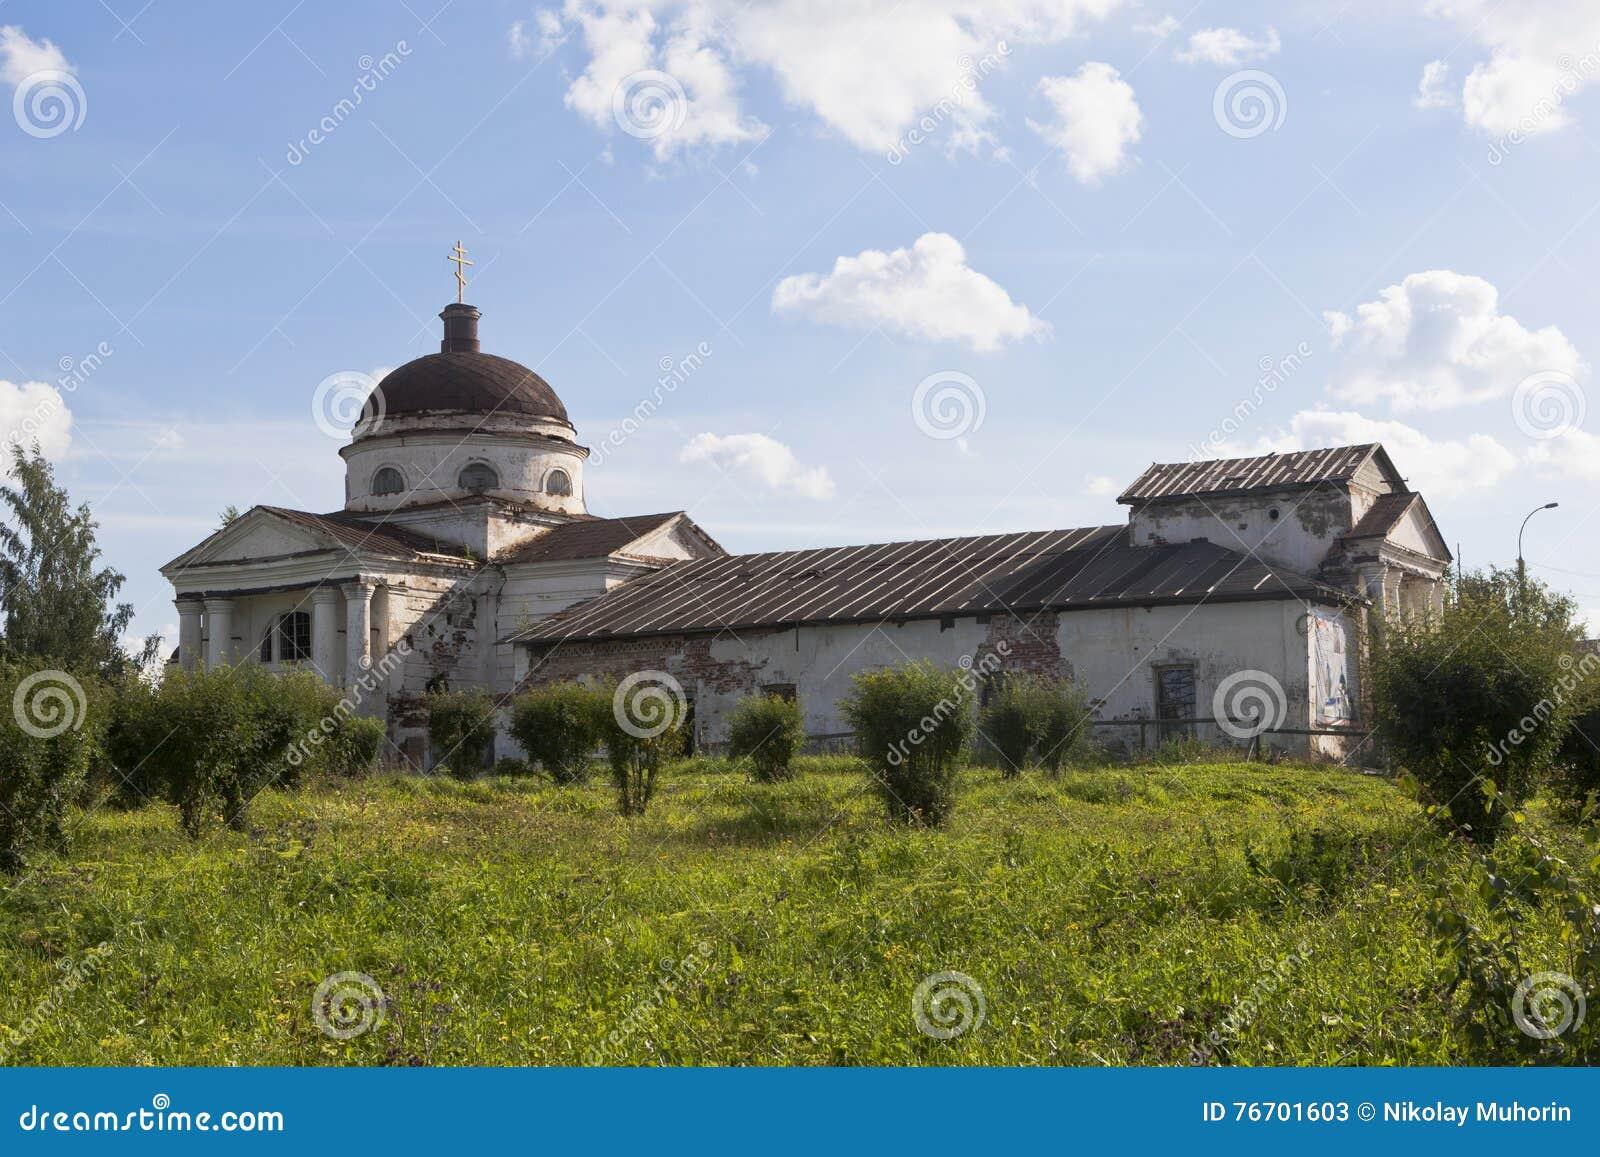 Kazan καθεδρικός ναός στην πόλη Kirillov, περιοχή Vologda